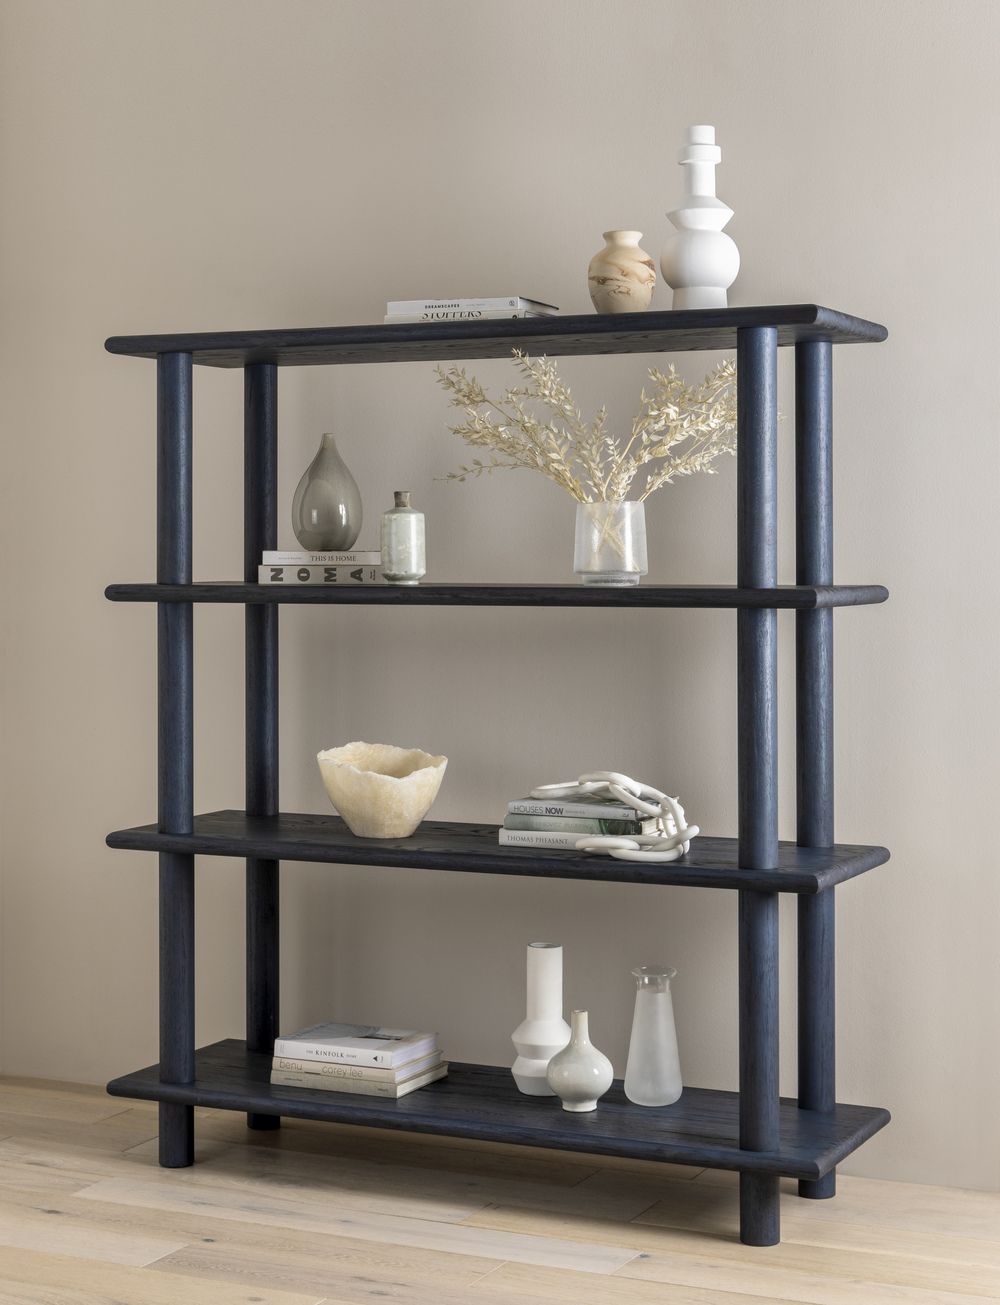 Four Hands - Mattia Bookshelf